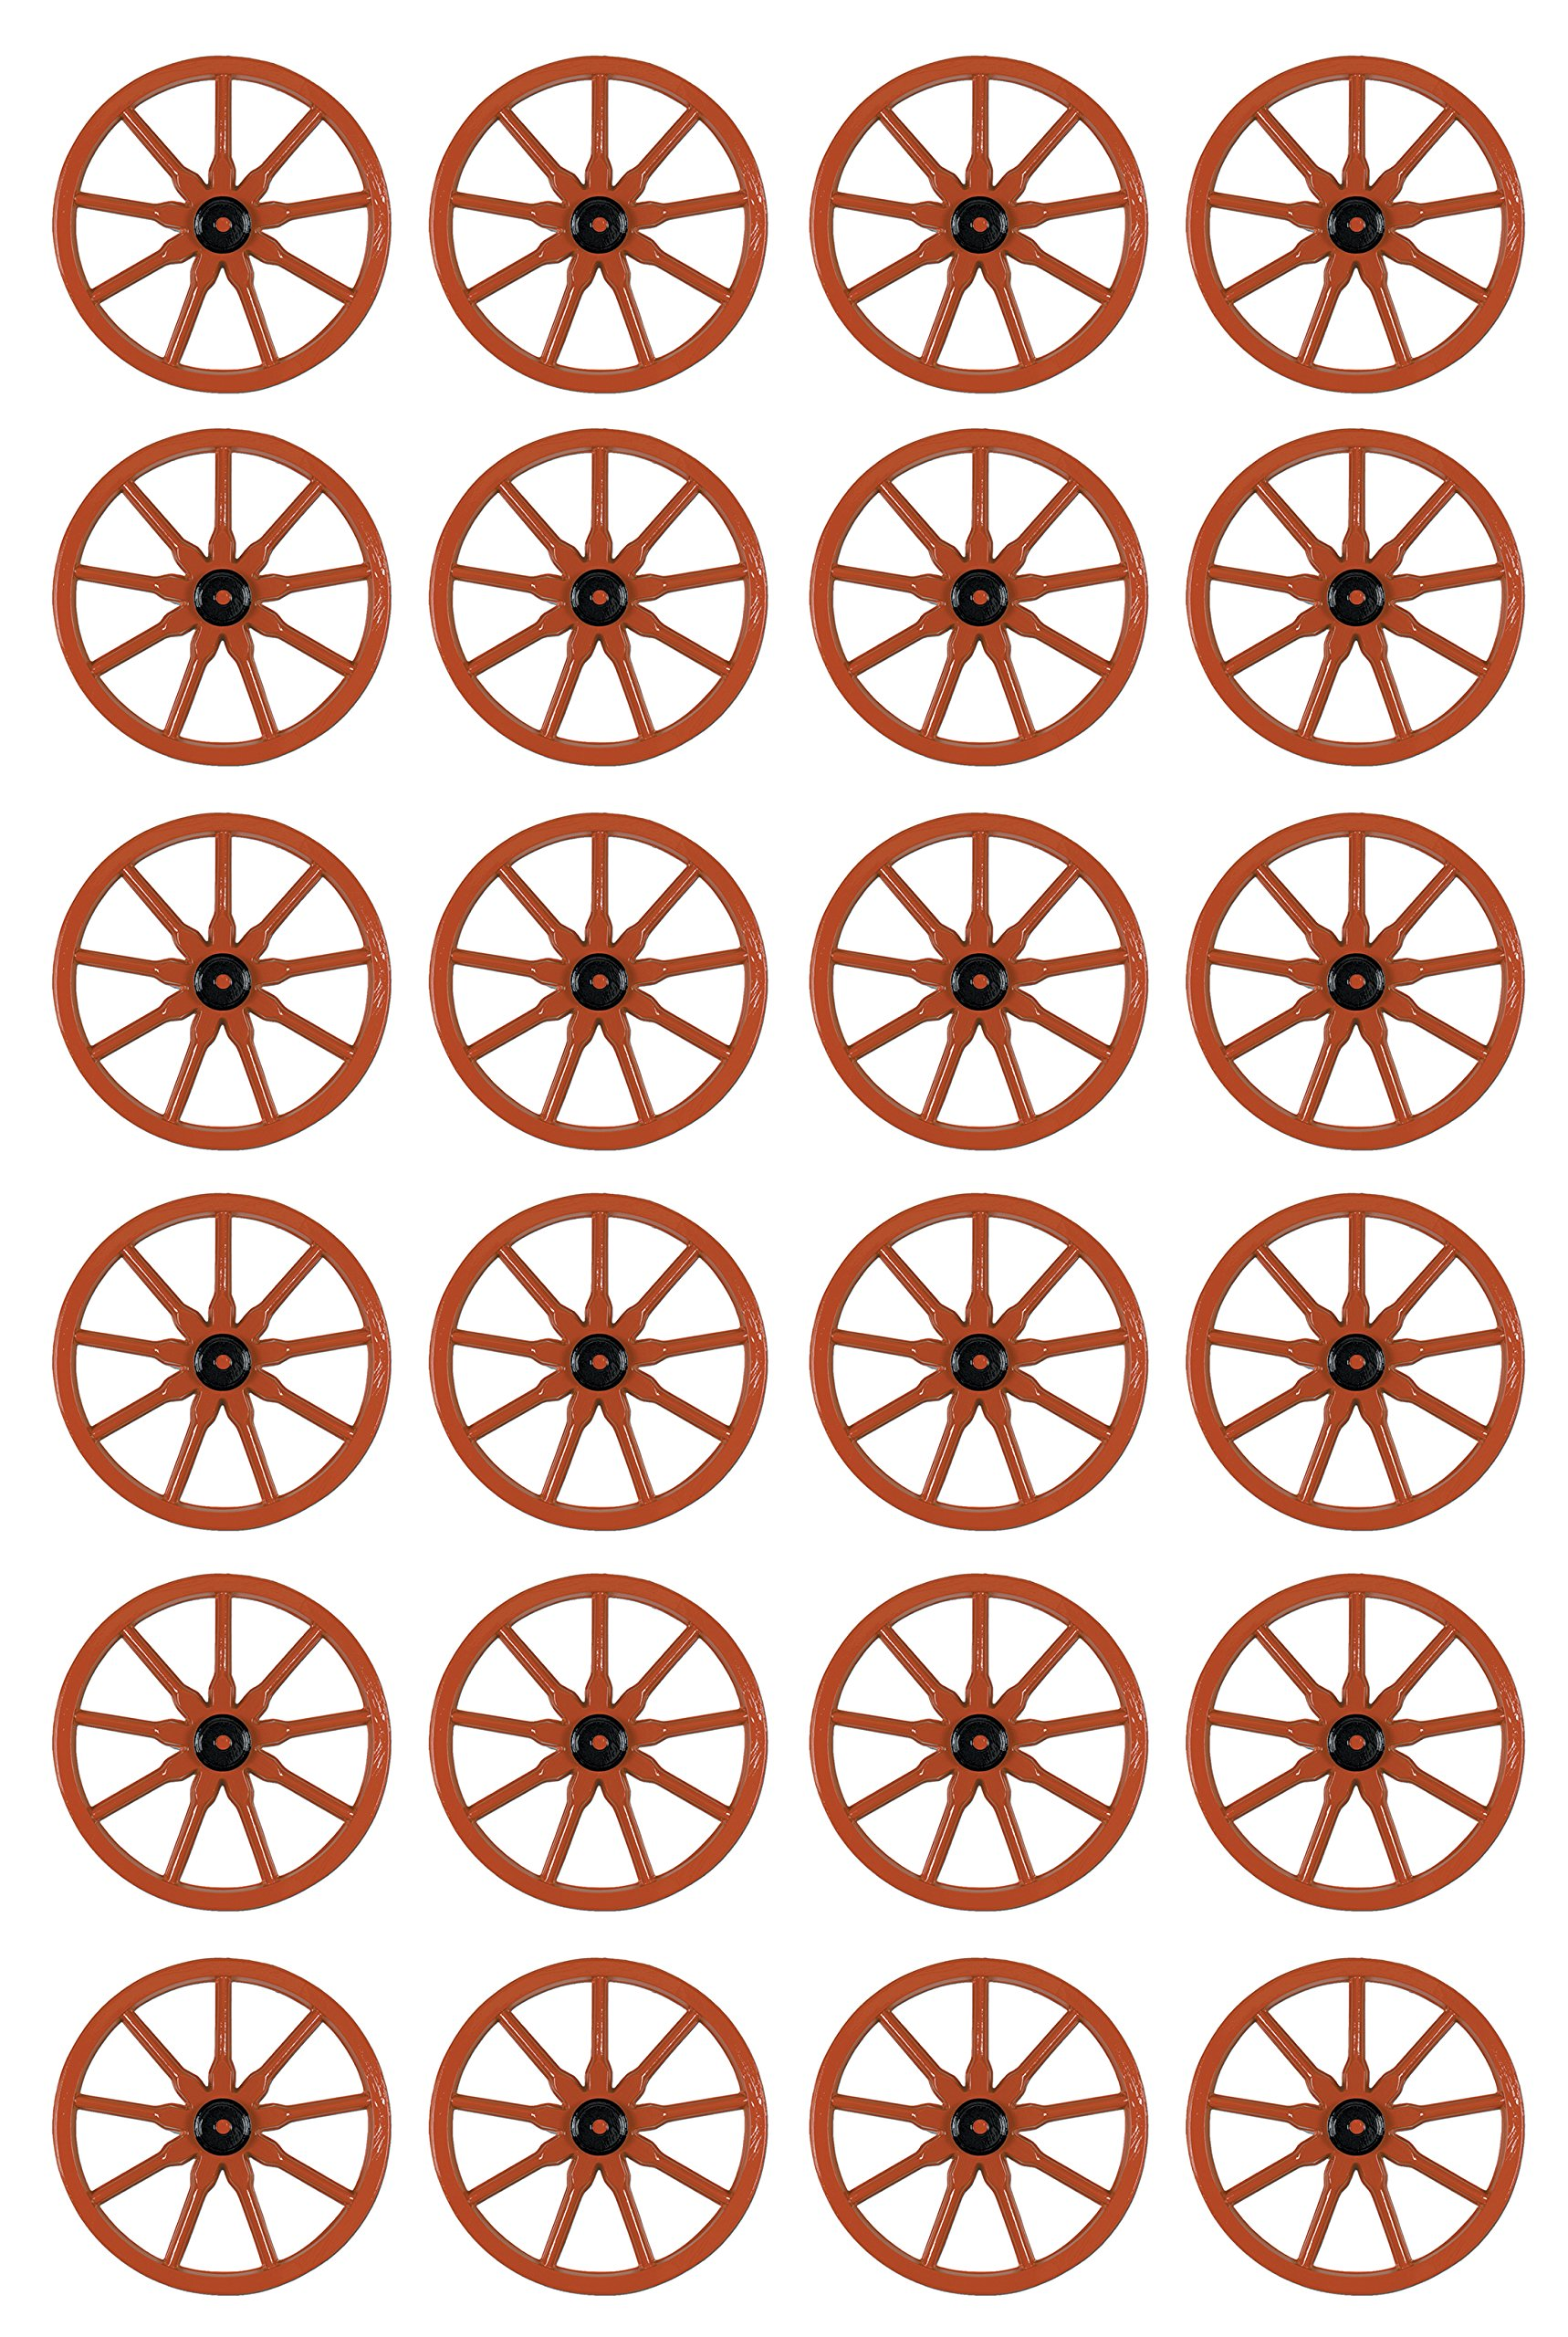 Beistle 55570 24-Pack Plastic Wagon Wheel, 23-Inch